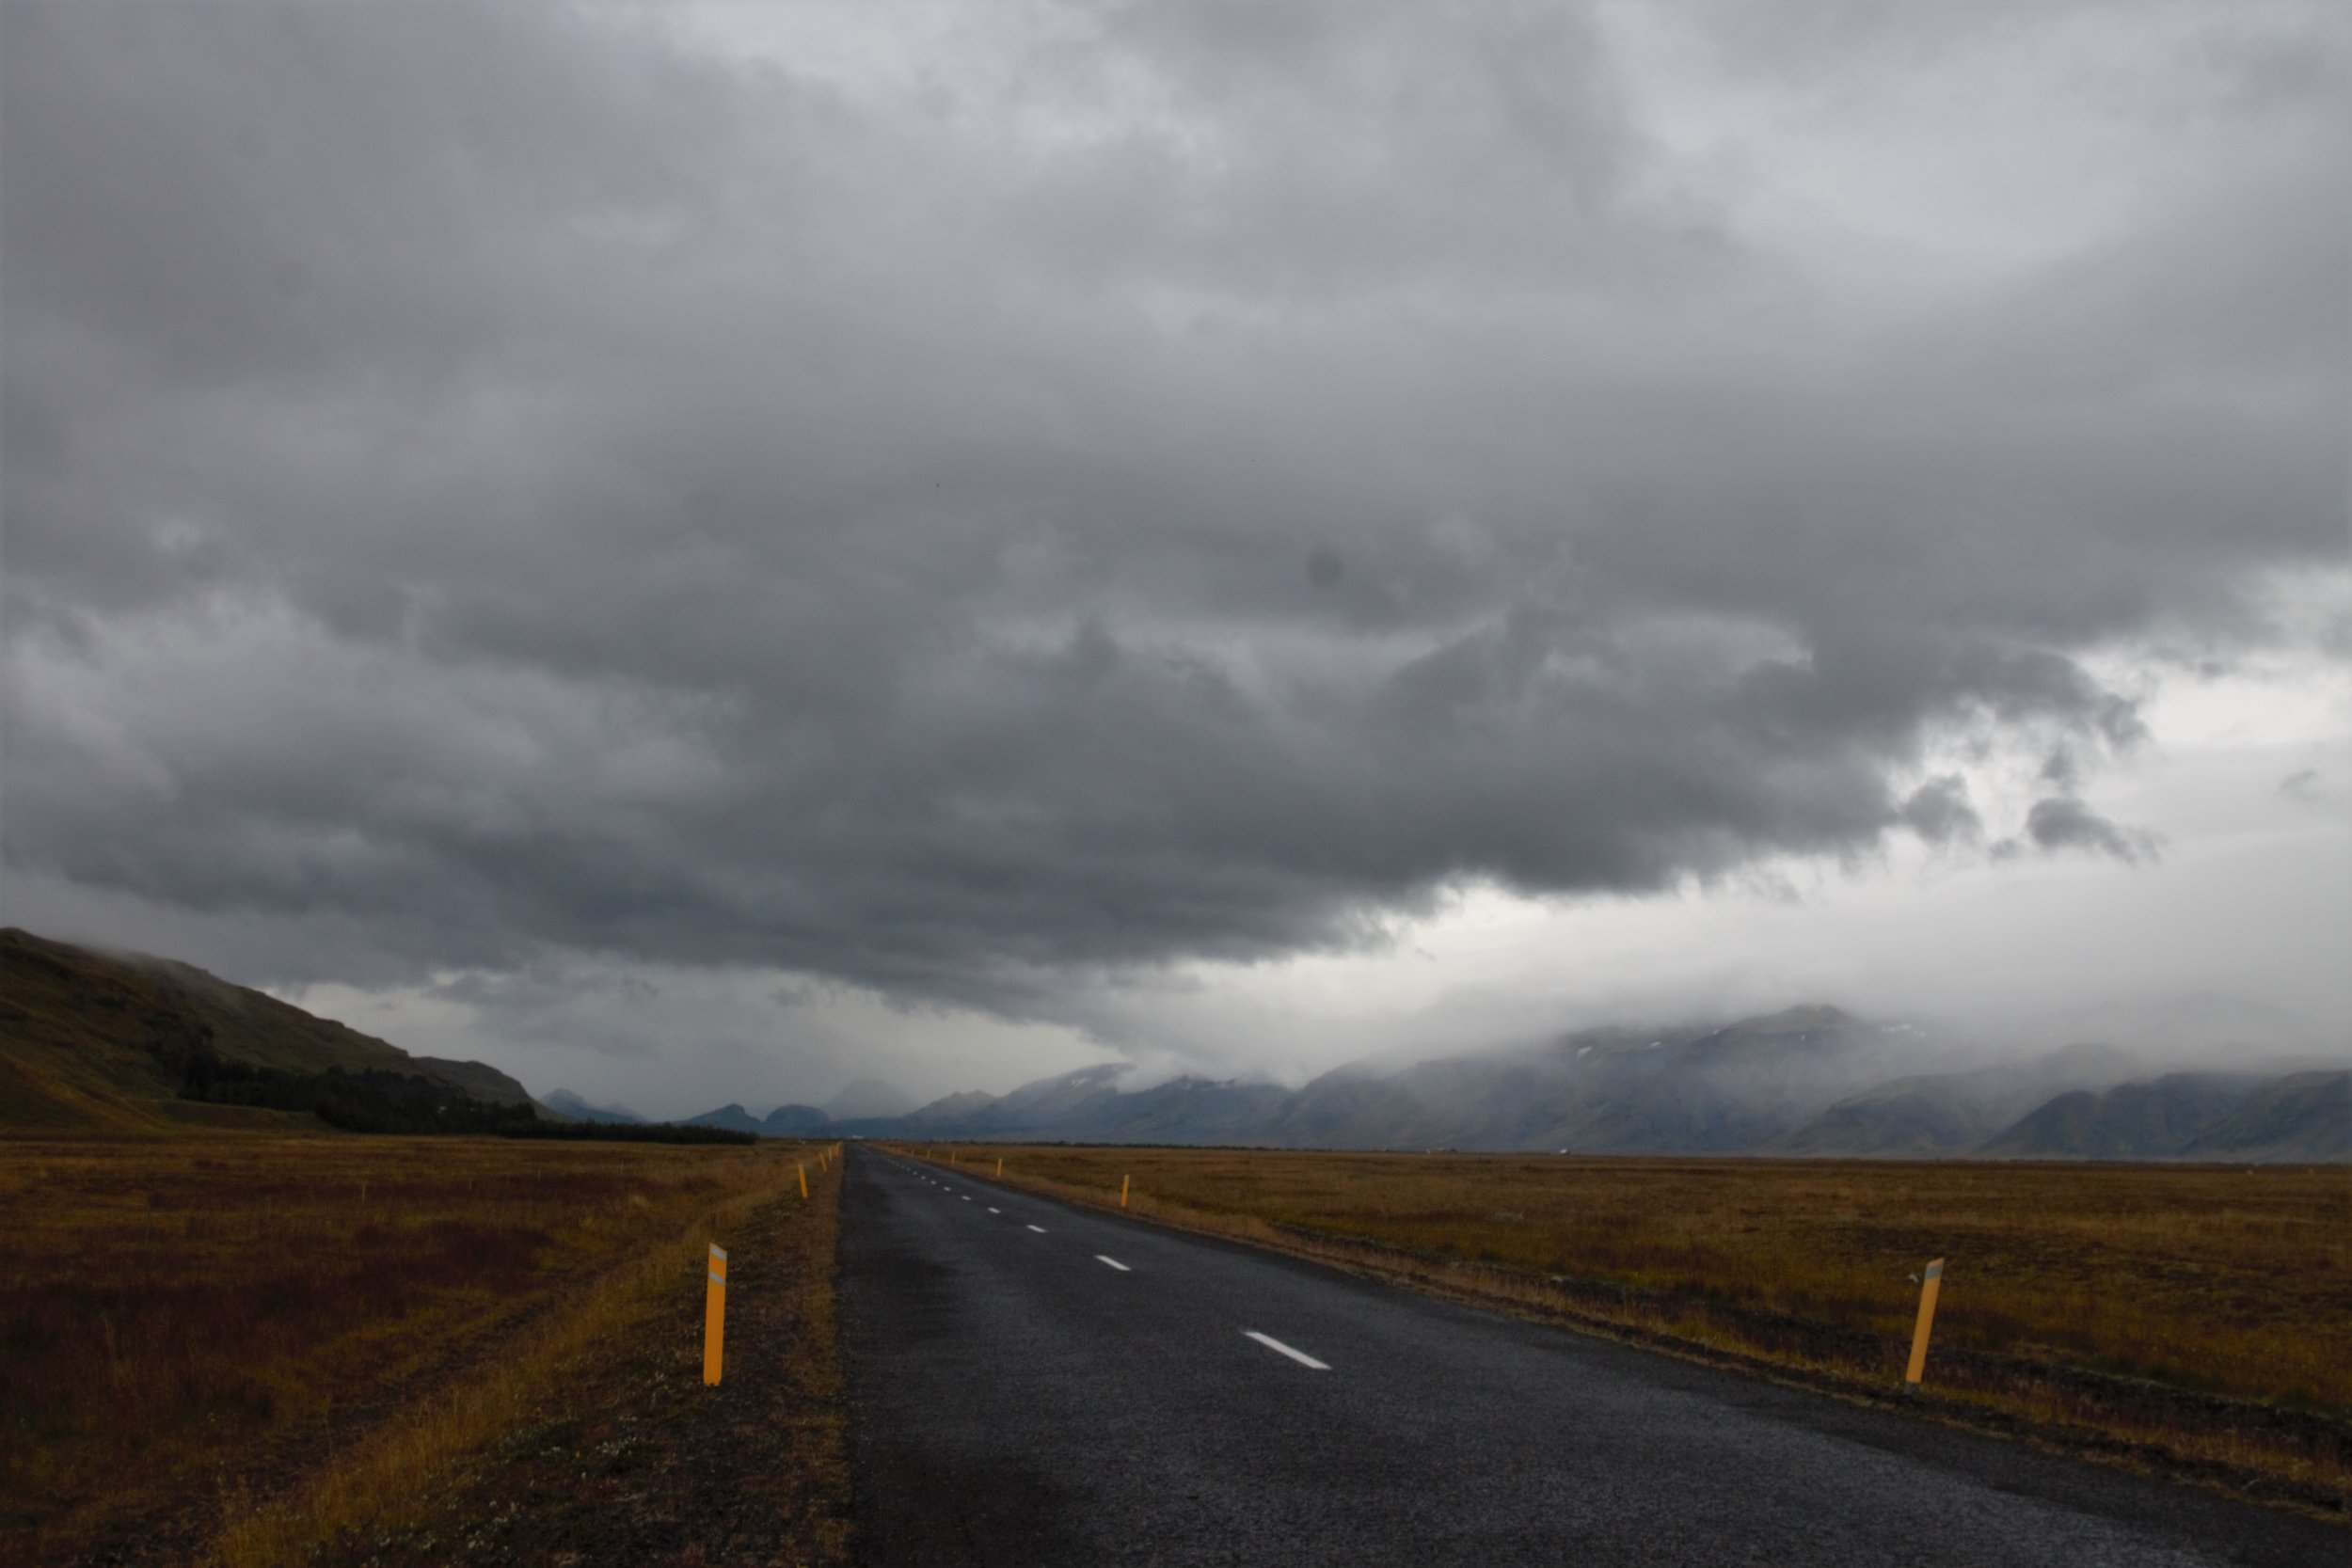 The misty, rainy road back into the highland.